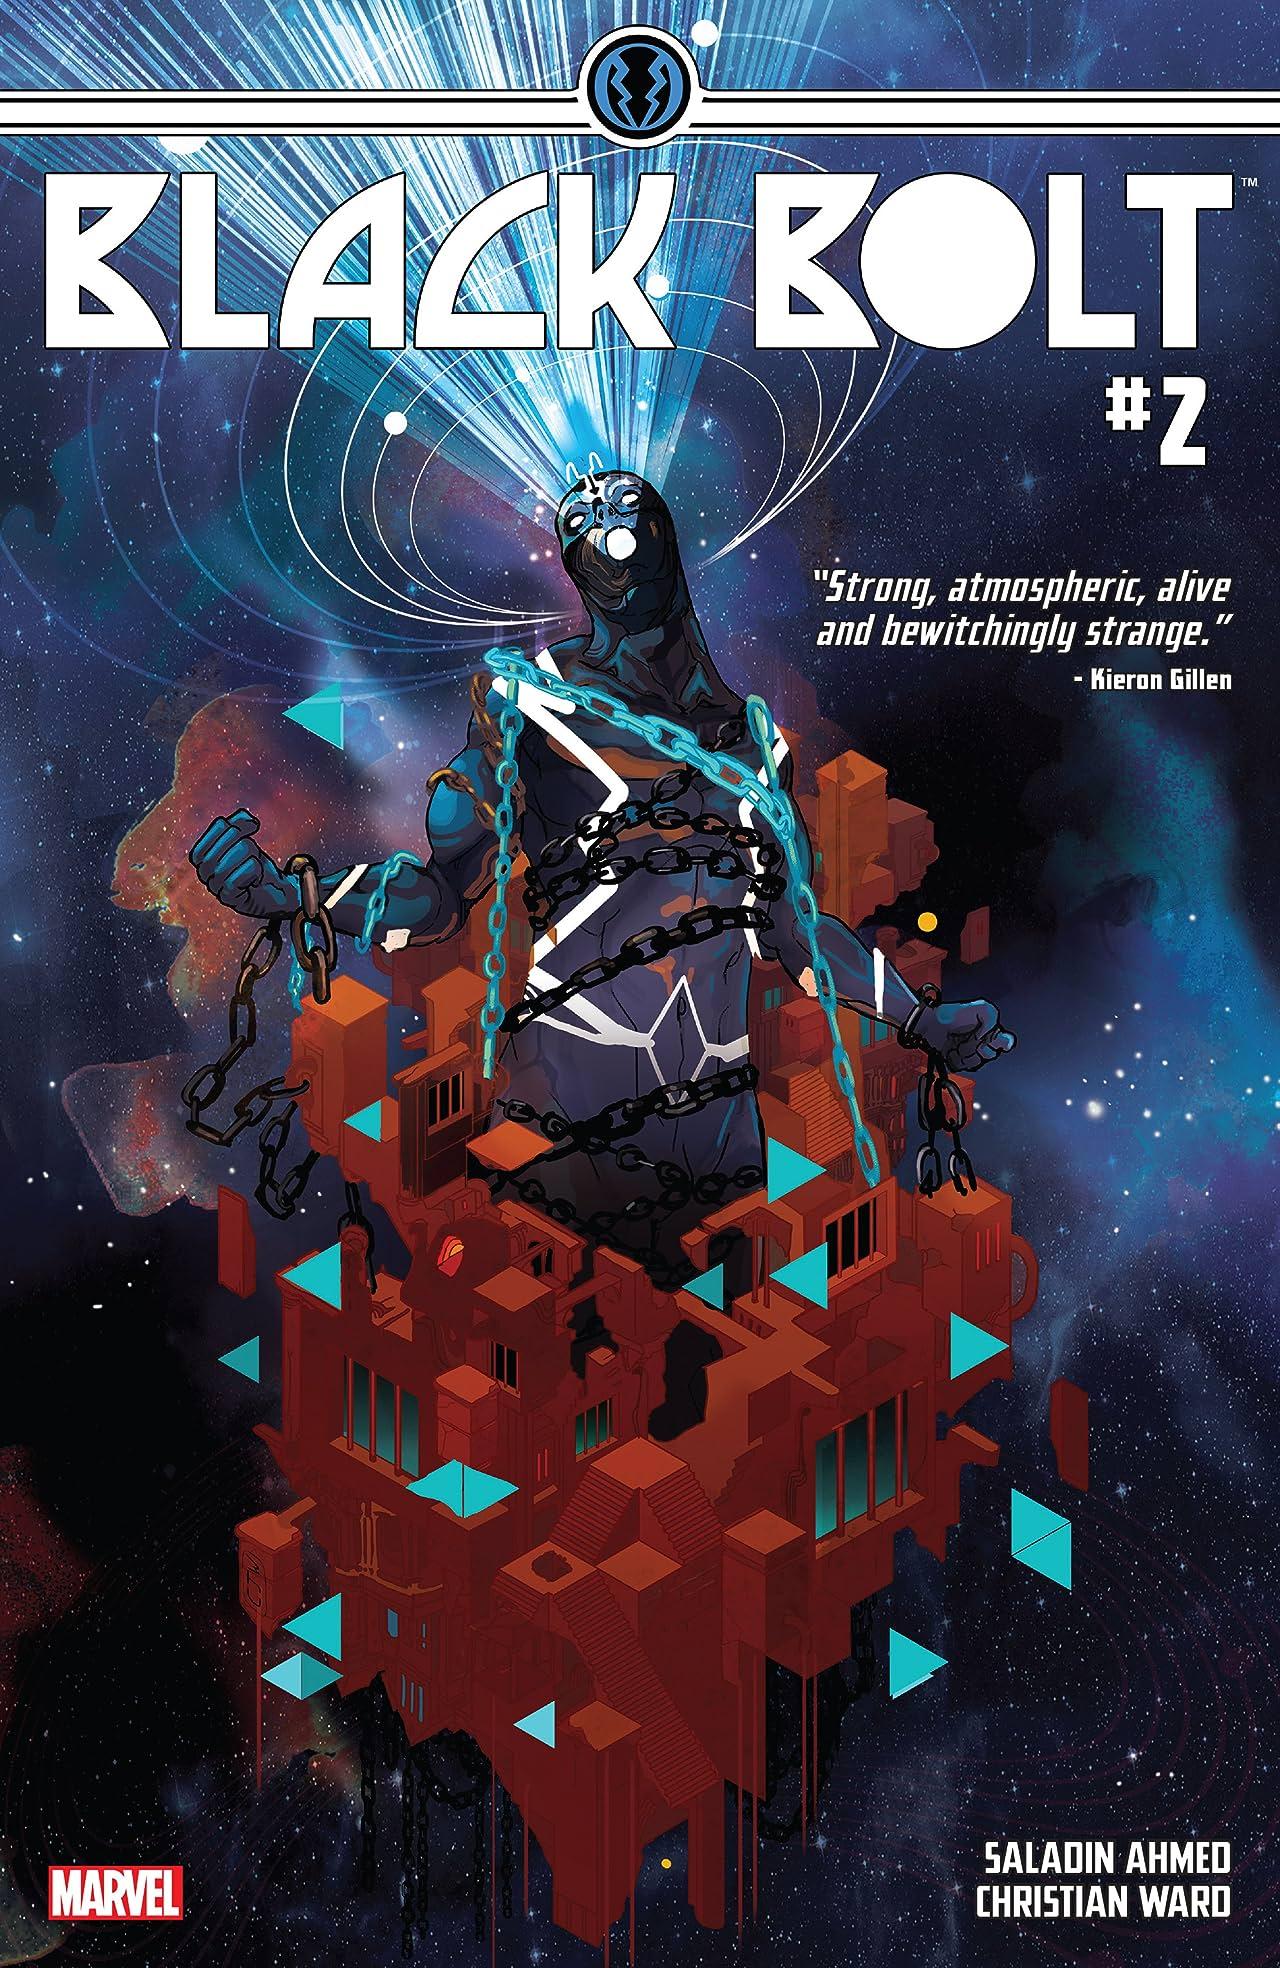 Black Bolt (2017-2018) #2